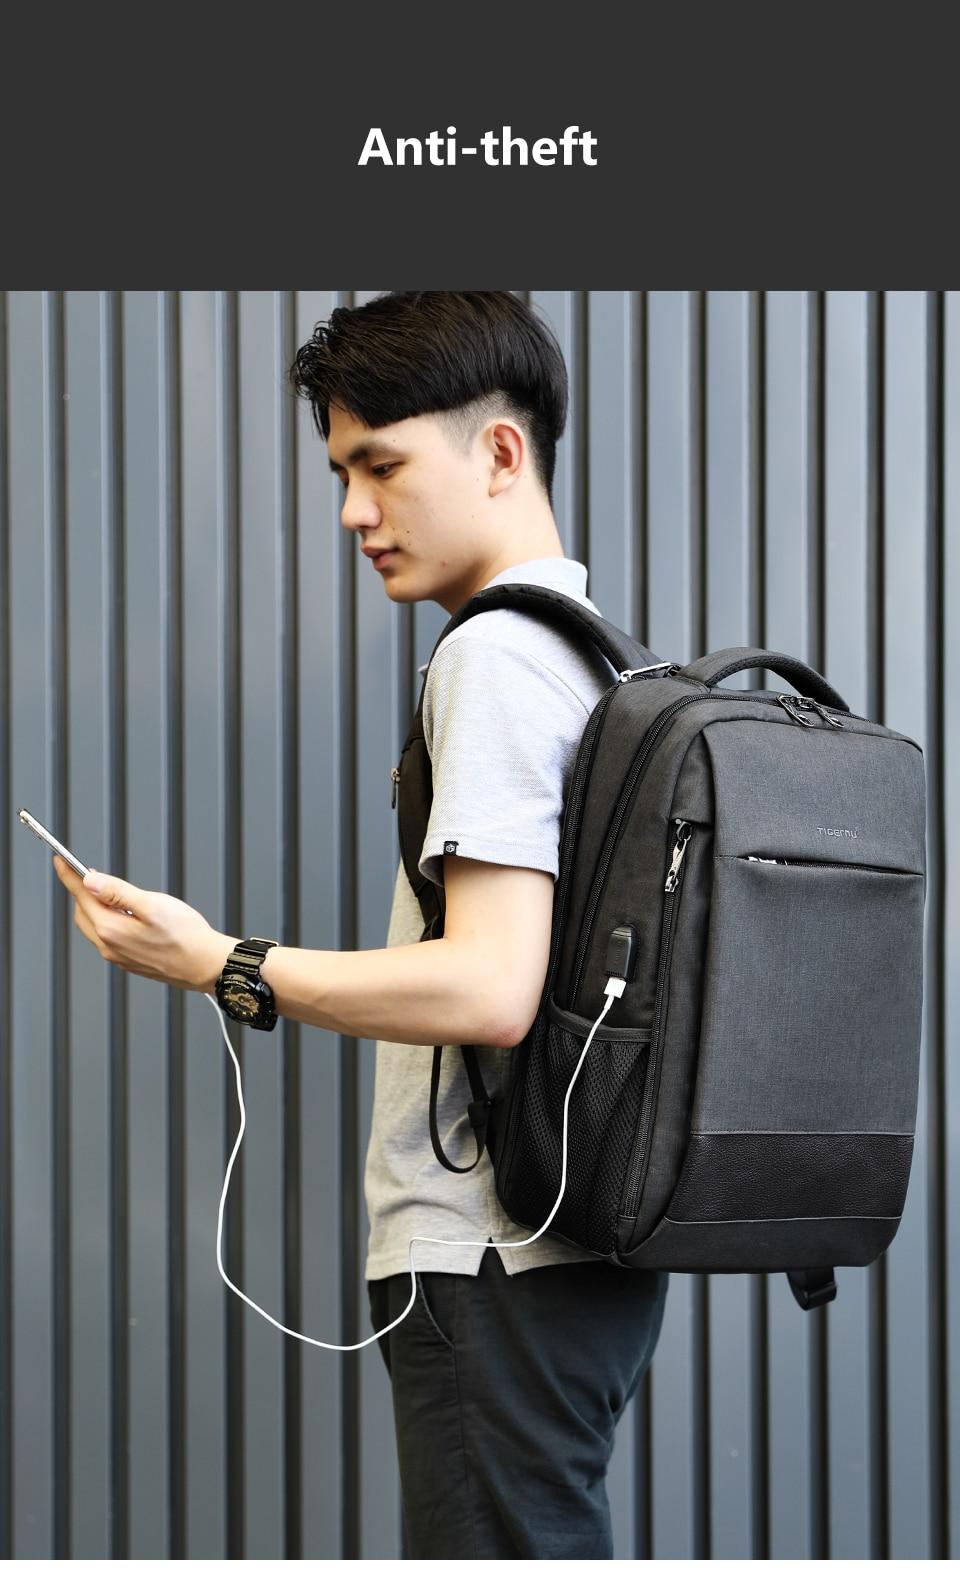 3.NEW usb backpack